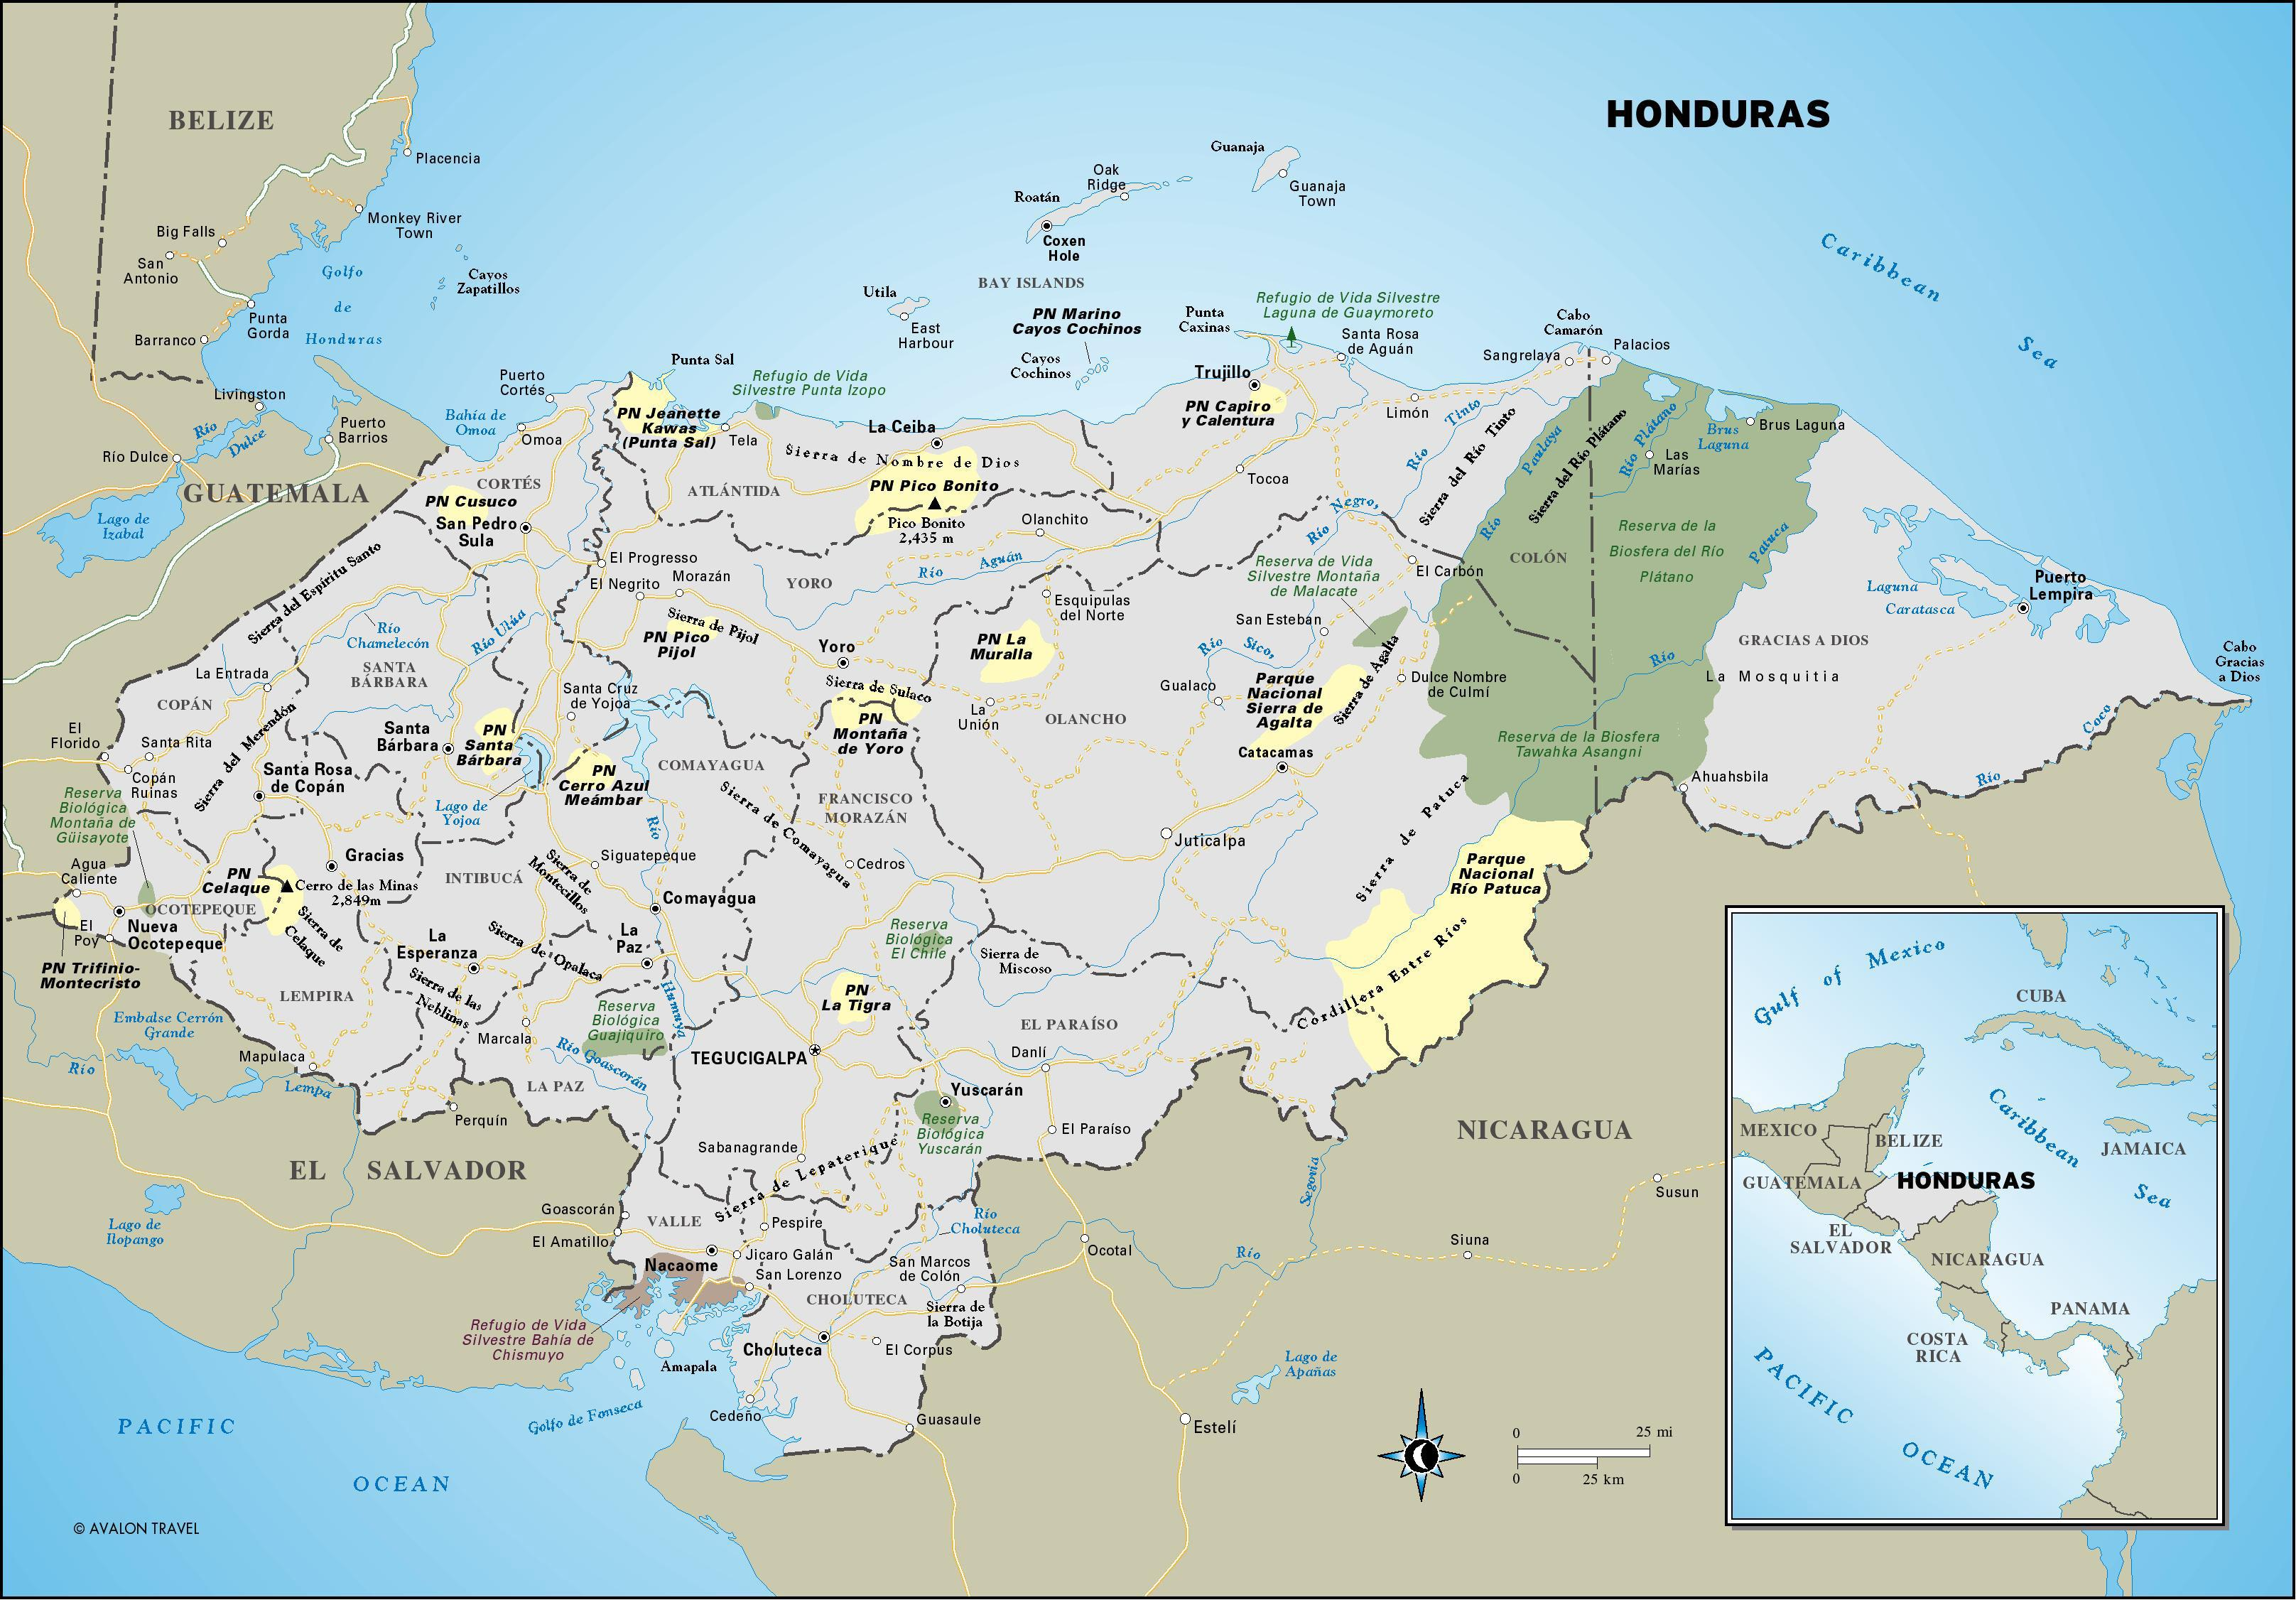 Honduras Turisticka Karta Karta Hondurasa Turist Srednja